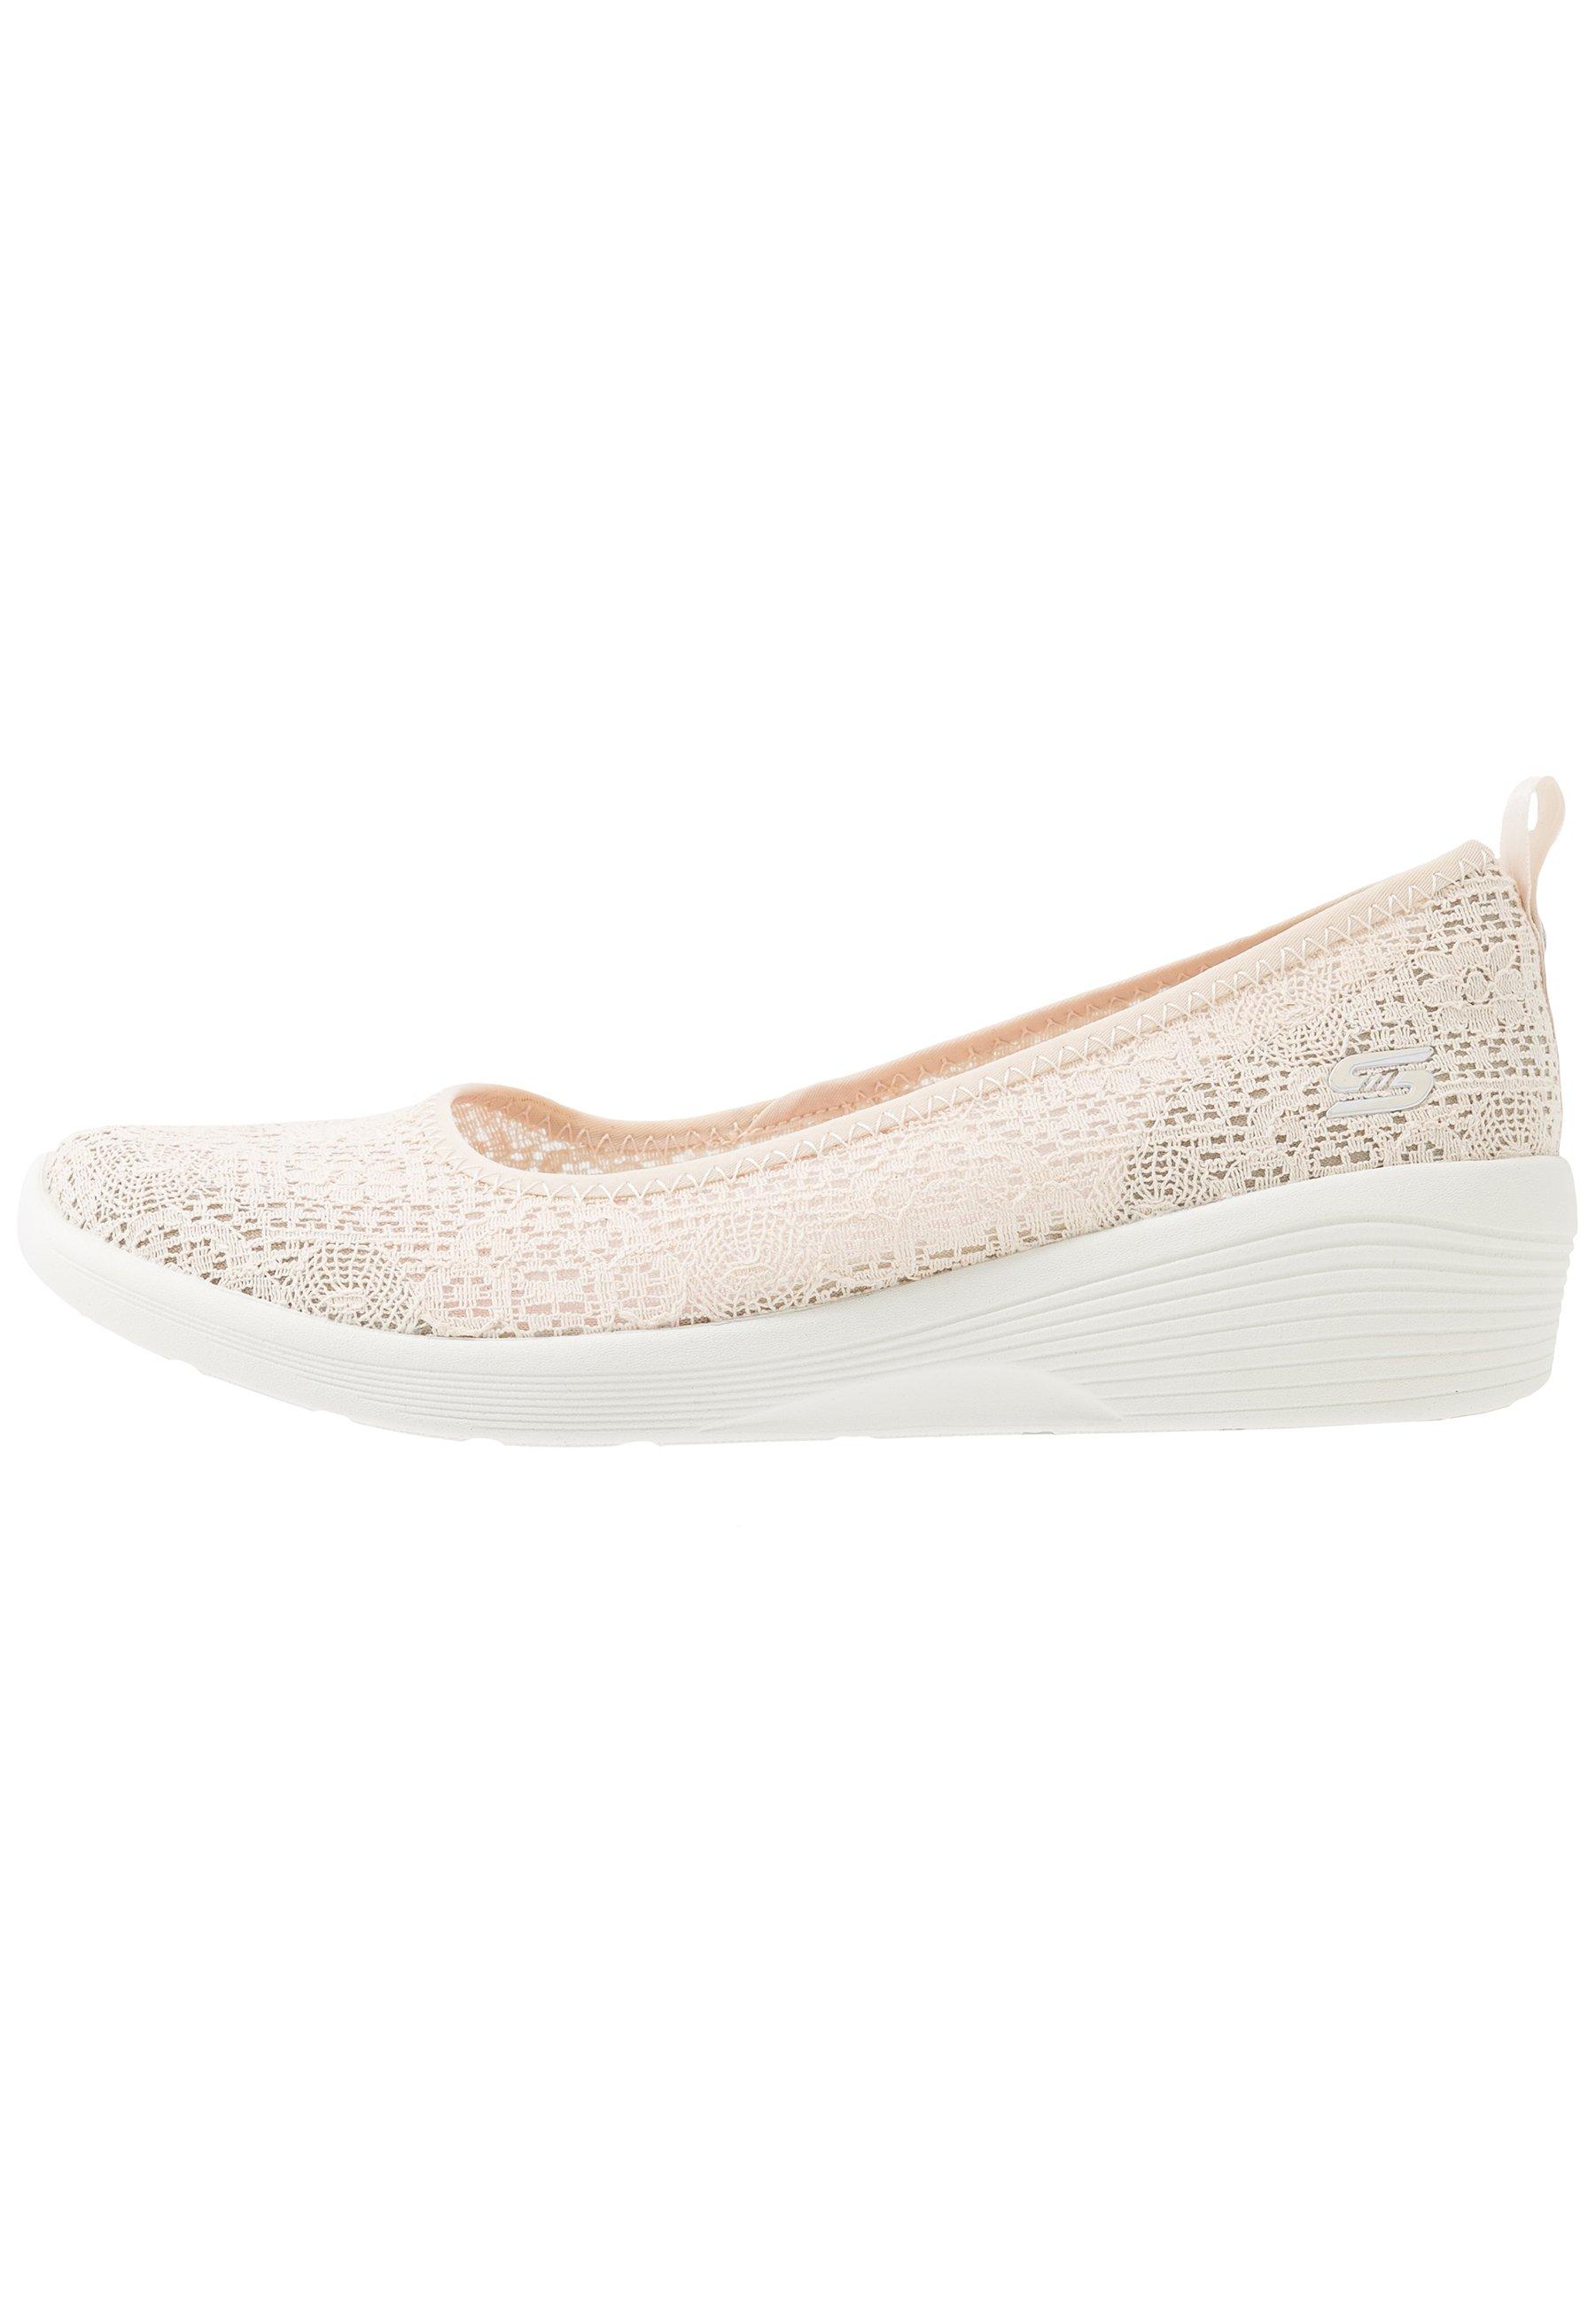 Skechers Arya - Klassischer Ballerina Natural/offwhite/beige